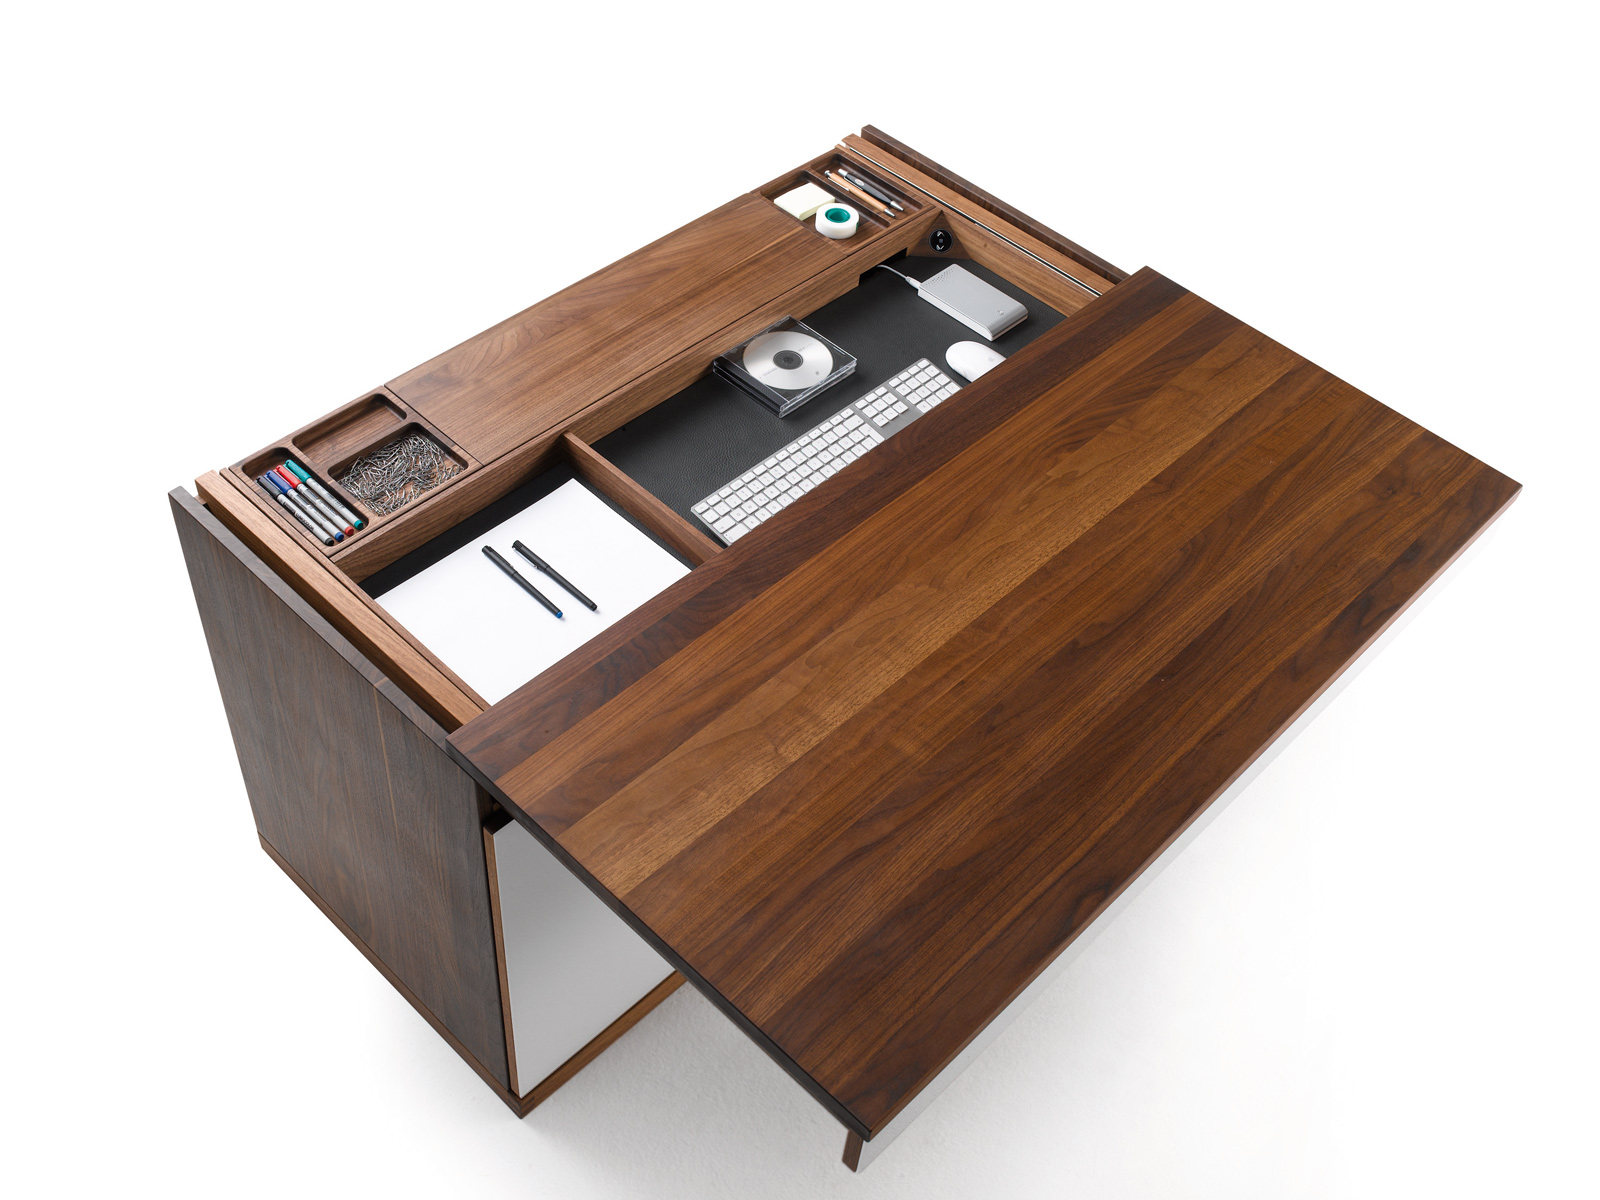 cubus secretaire noordkaap meubelen. Black Bedroom Furniture Sets. Home Design Ideas